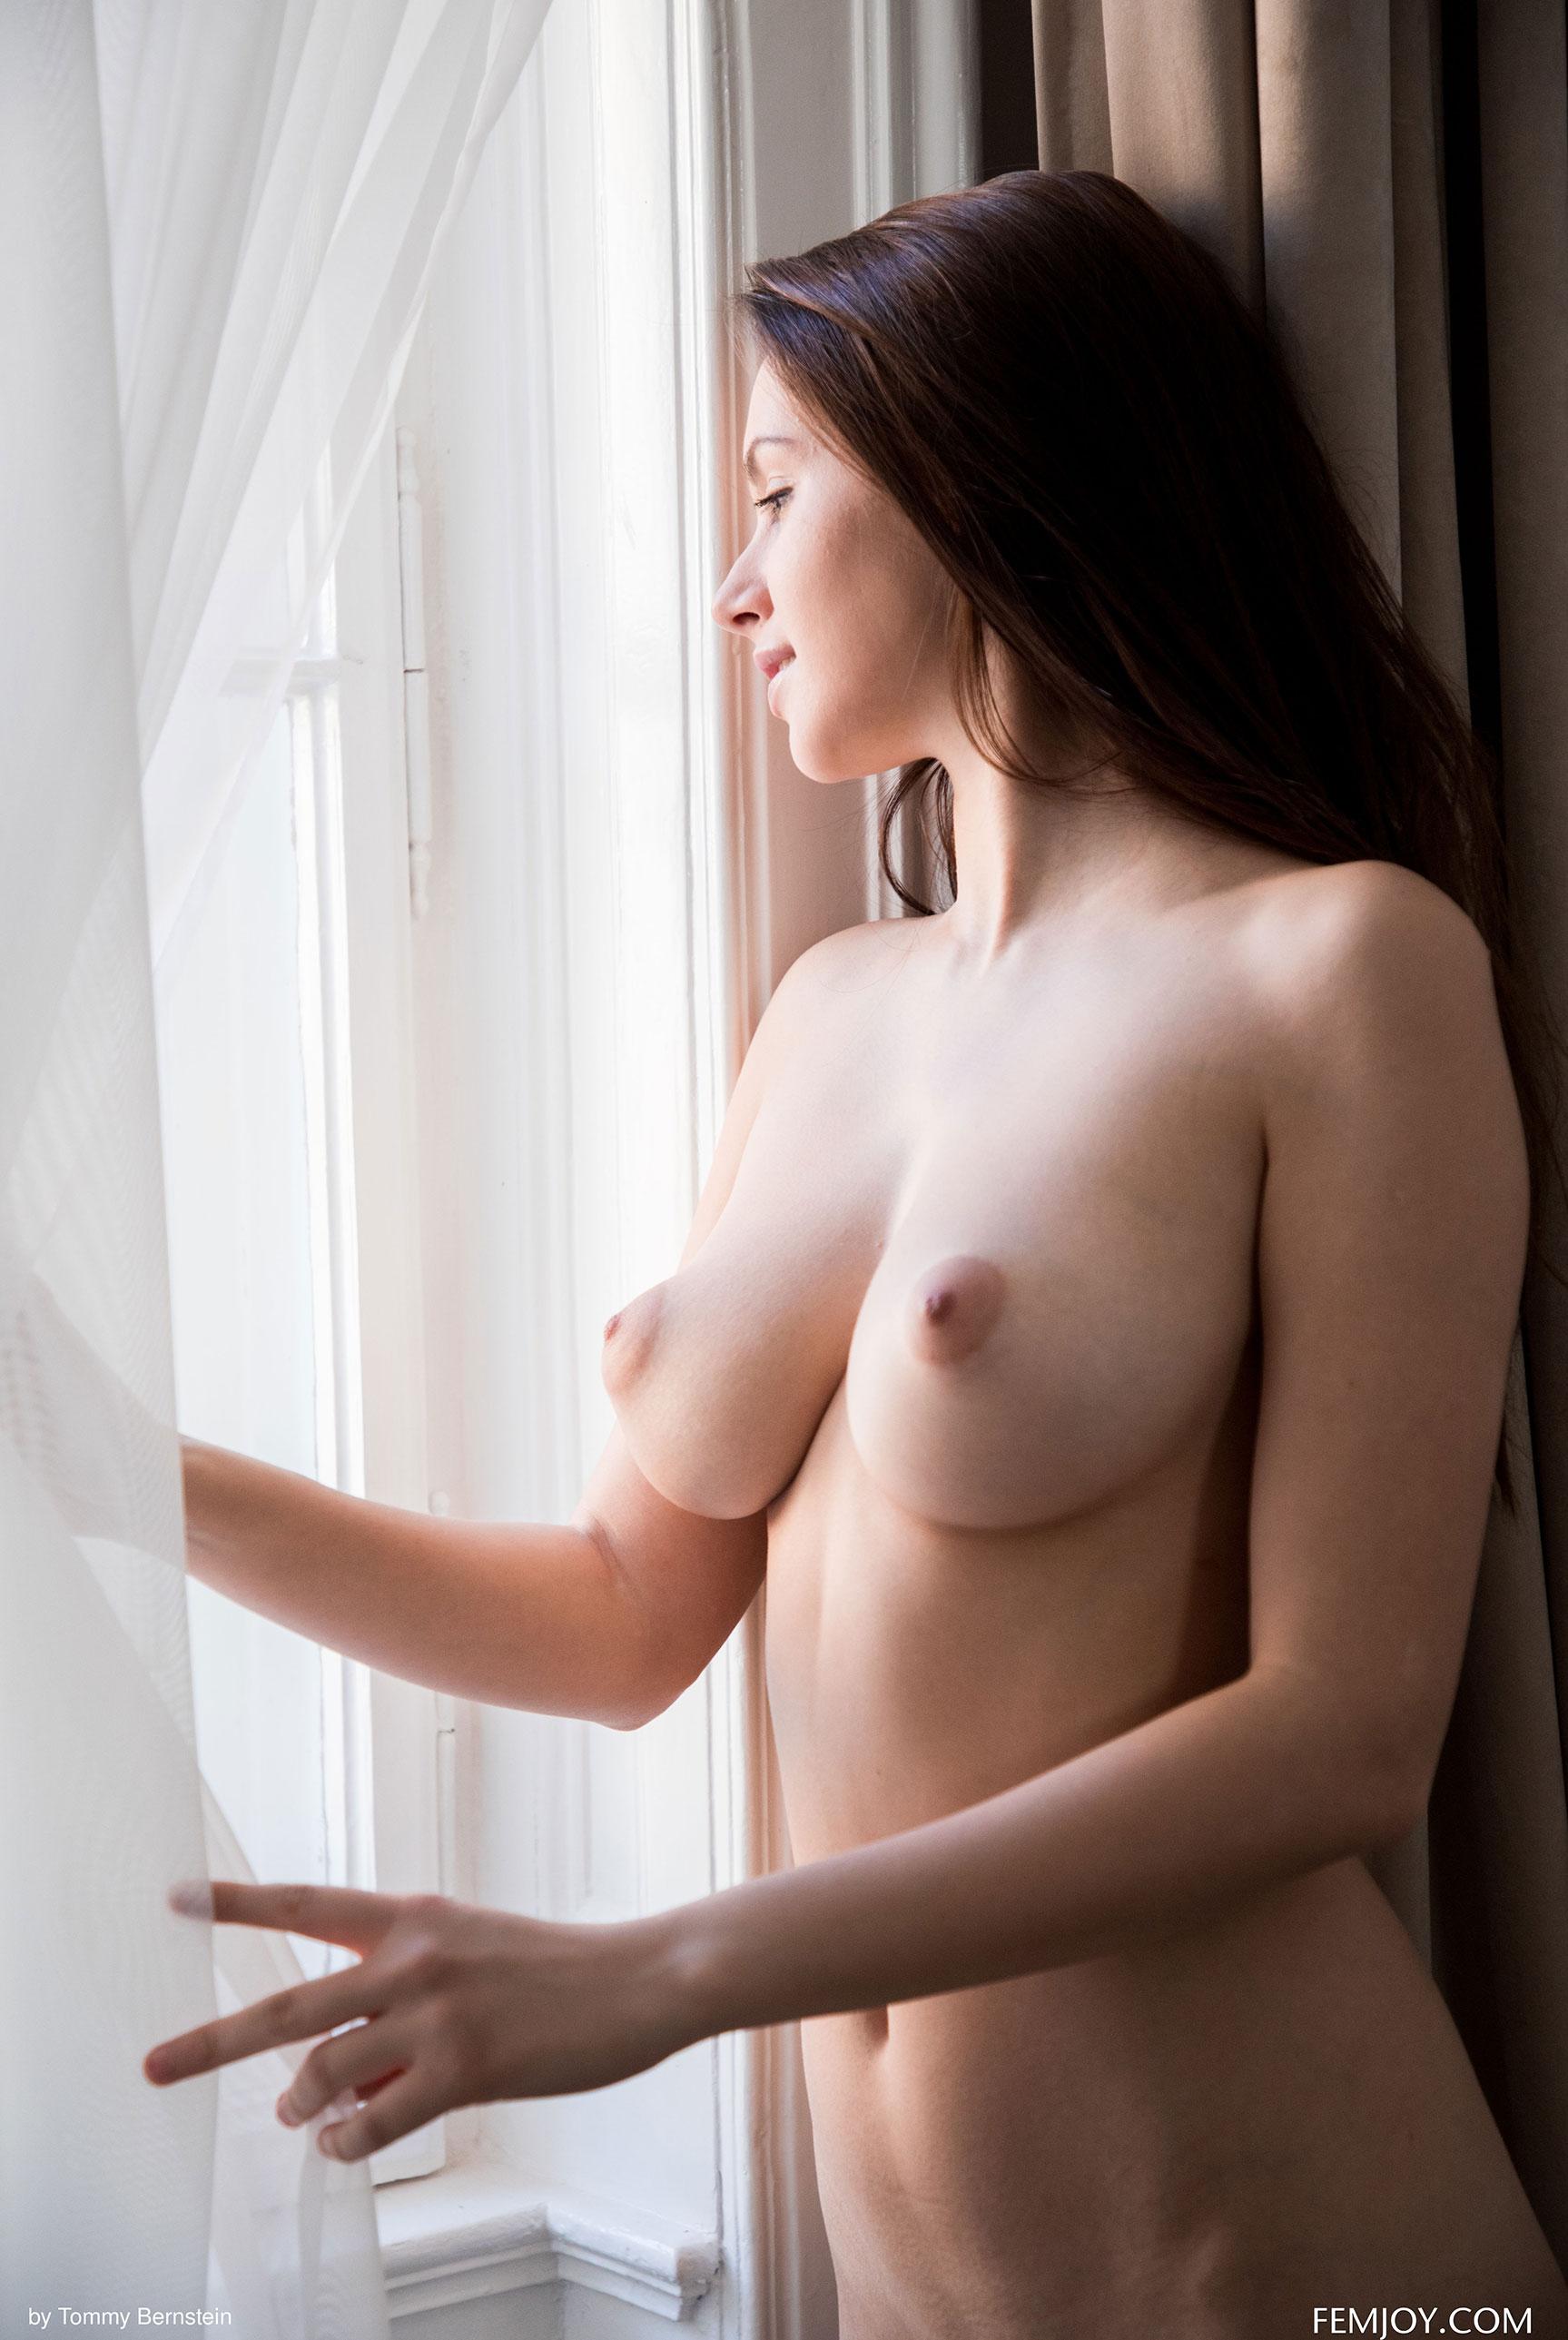 Навстречу новому дню - голая Алиса у окна / фото 01